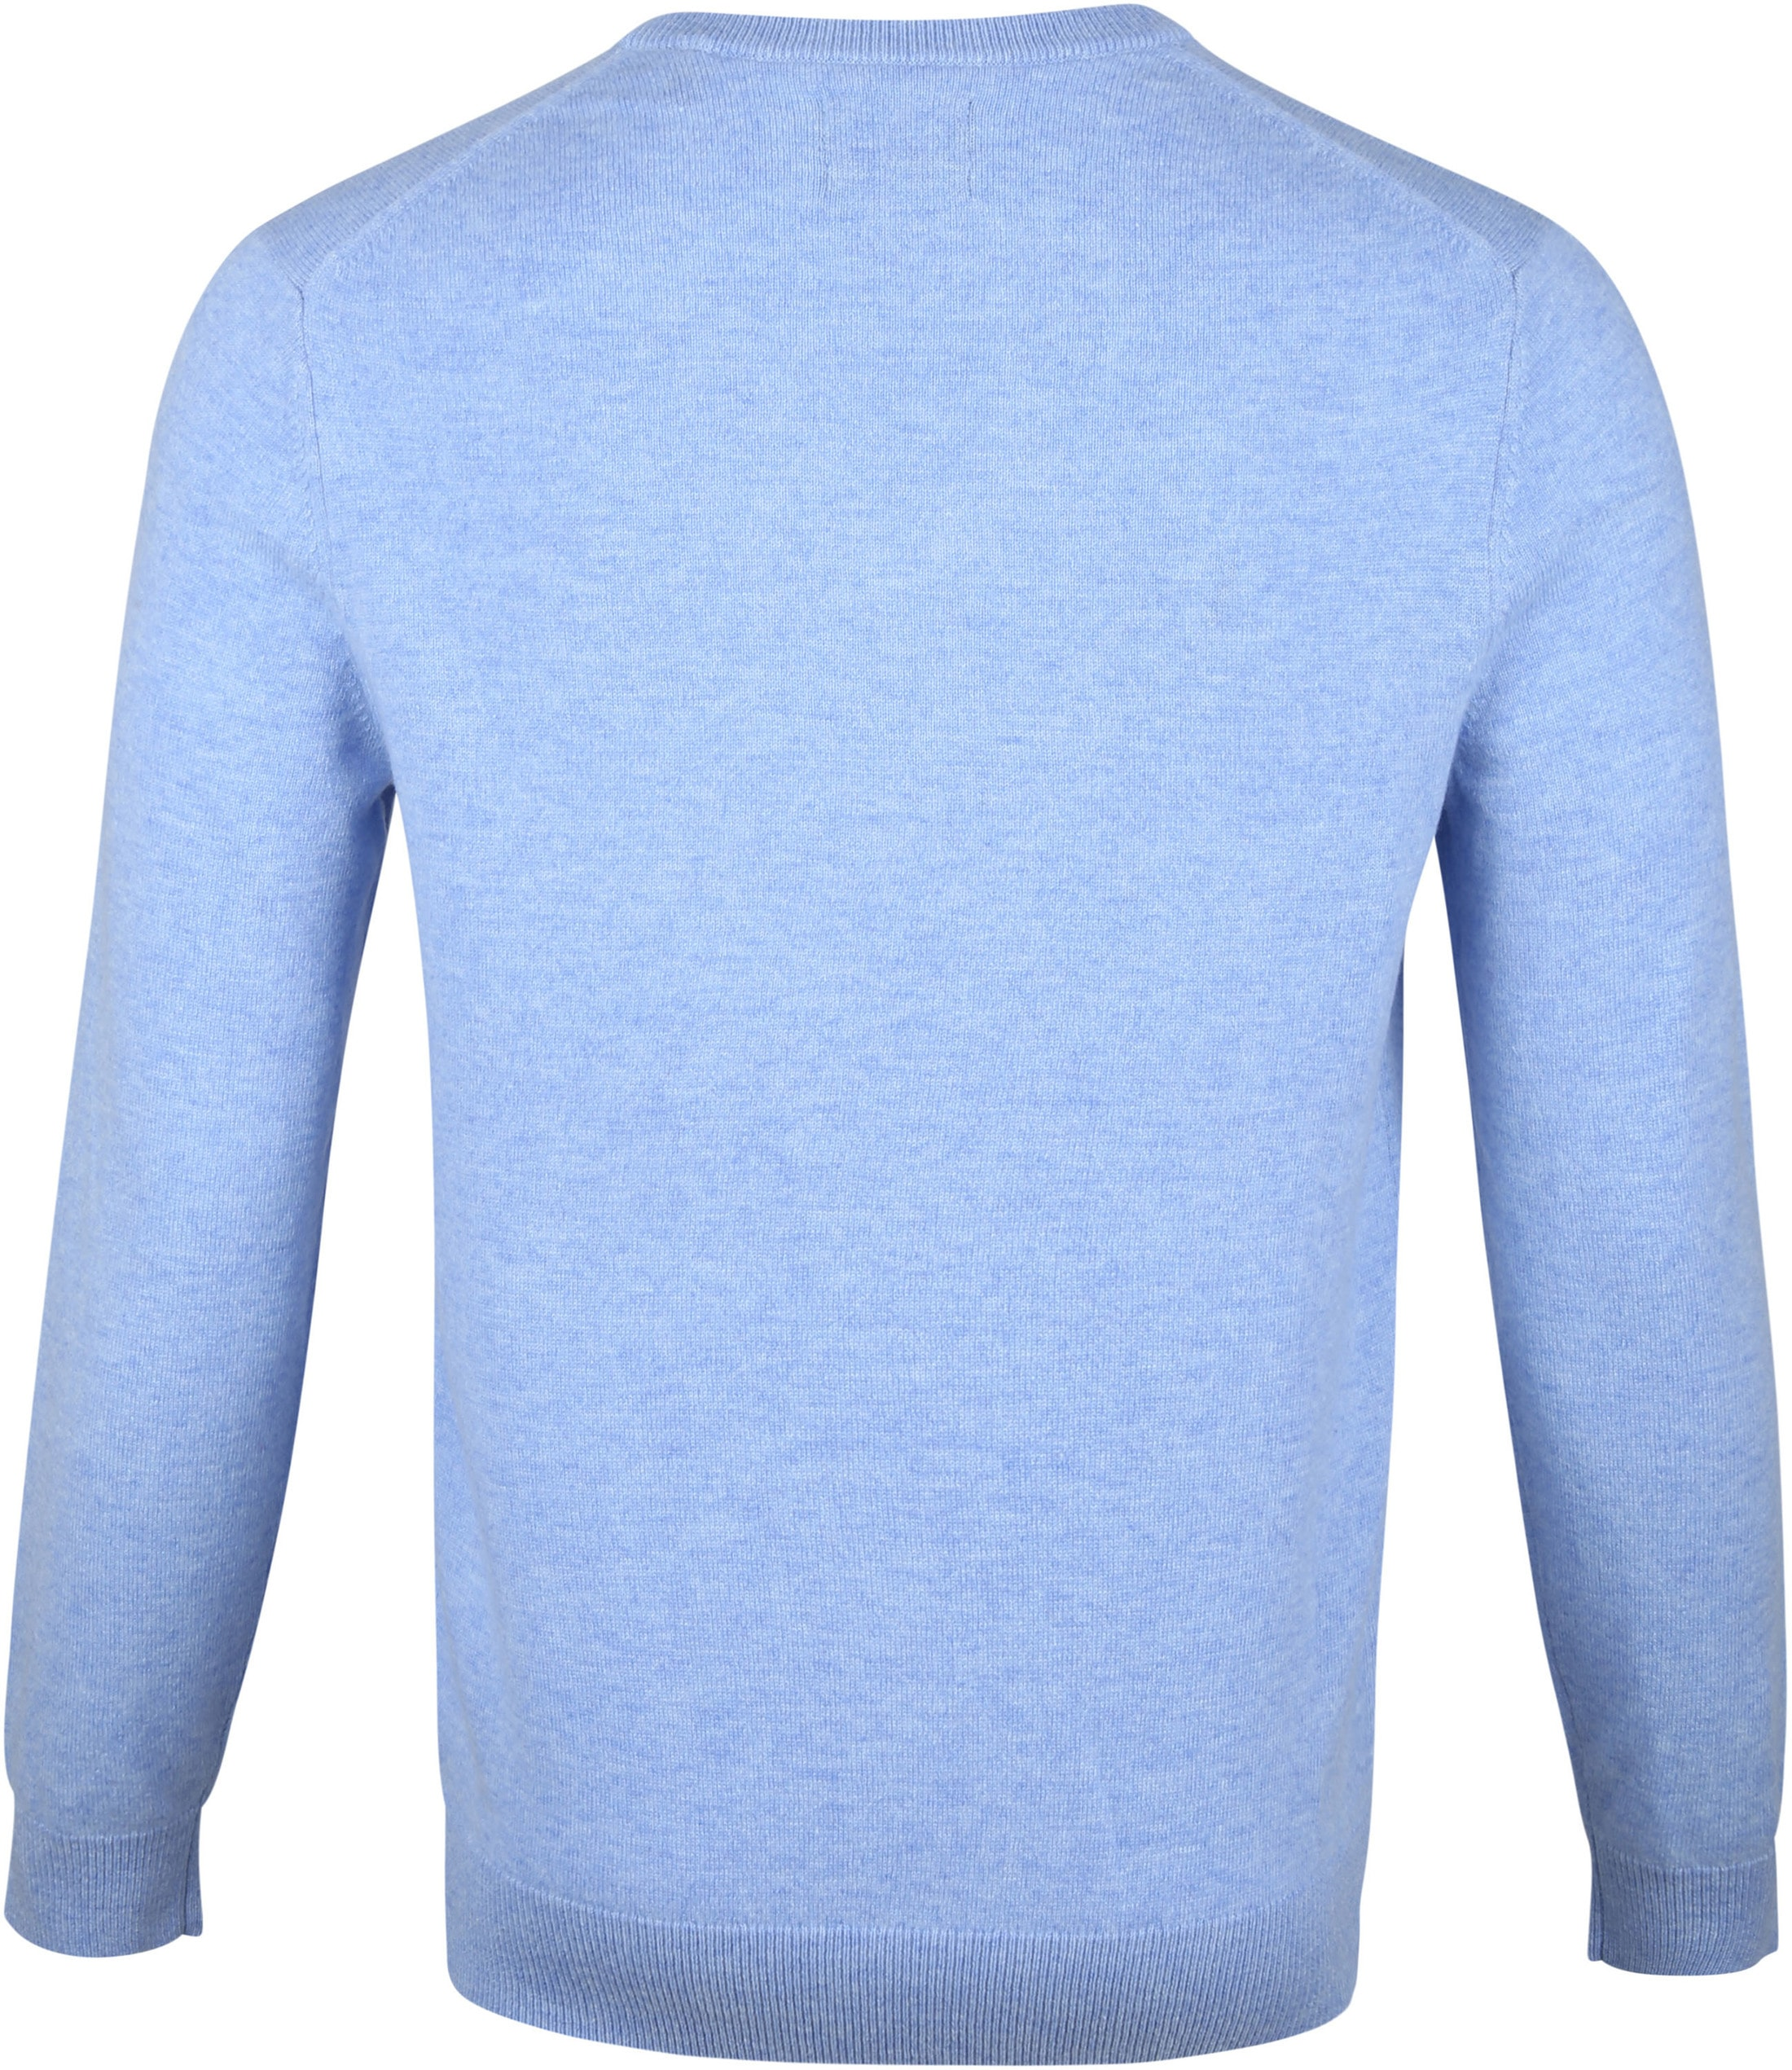 Gant Lambswool Pullover Light Blue photo 3